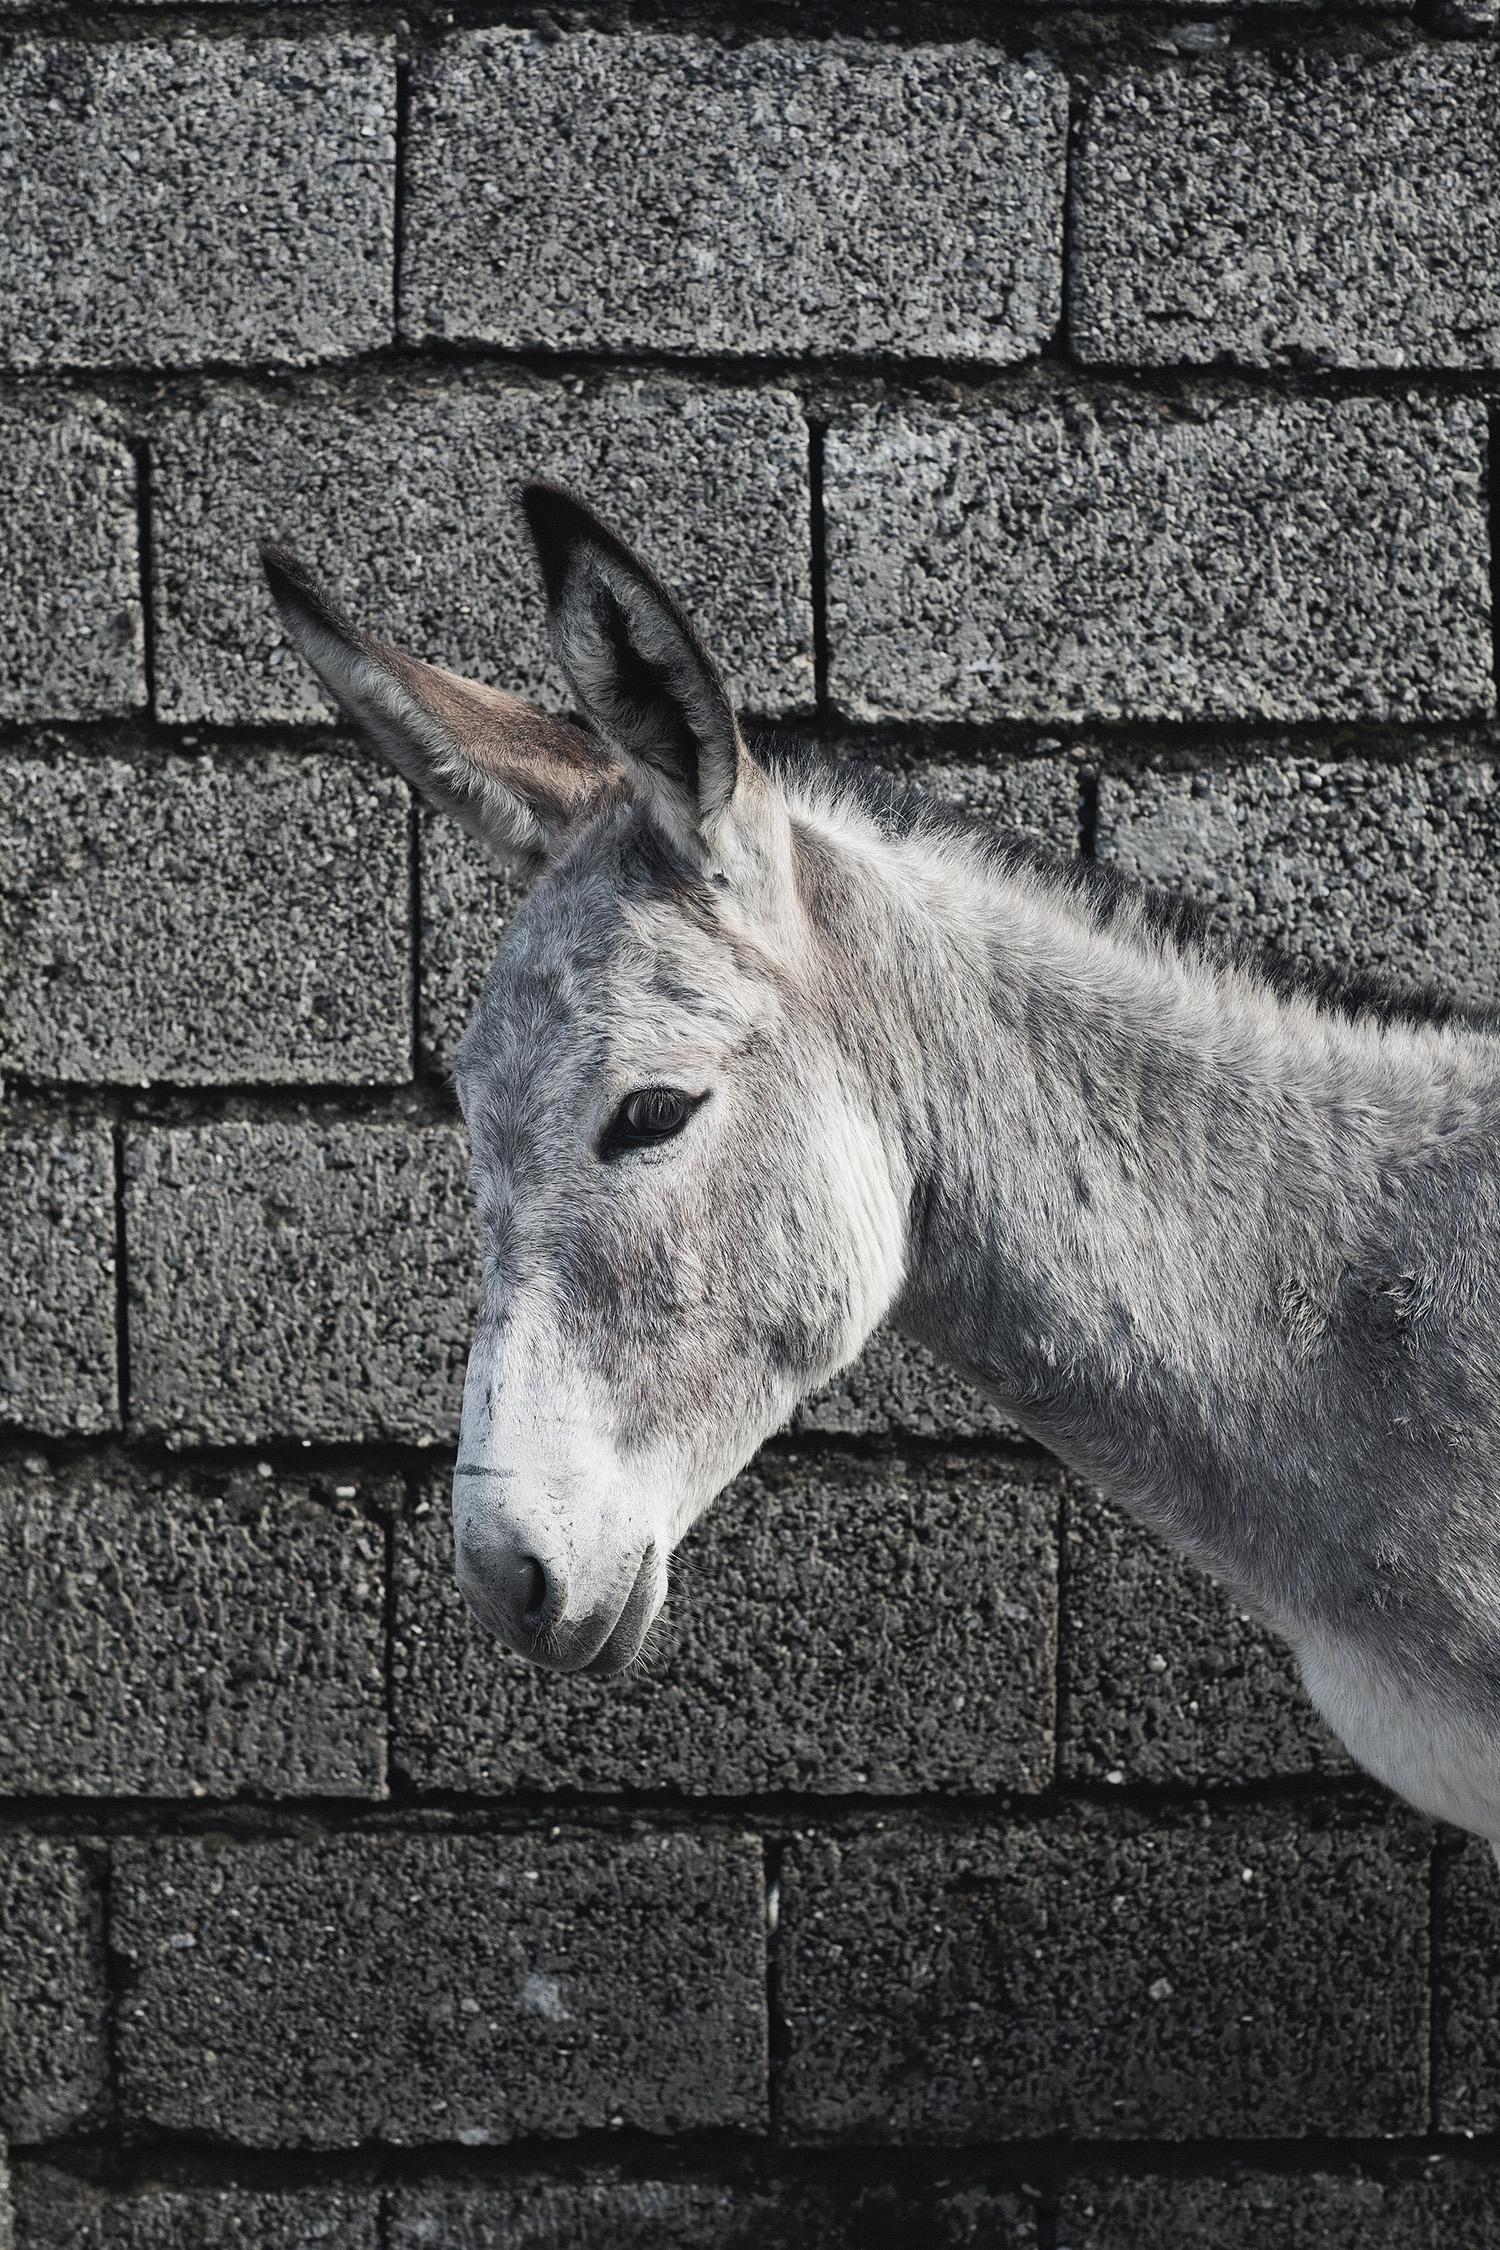 lifestyle-editorial-travel-washington-dc-malek-naz-photography-donkey-shomal-iran-bazaar.jpg